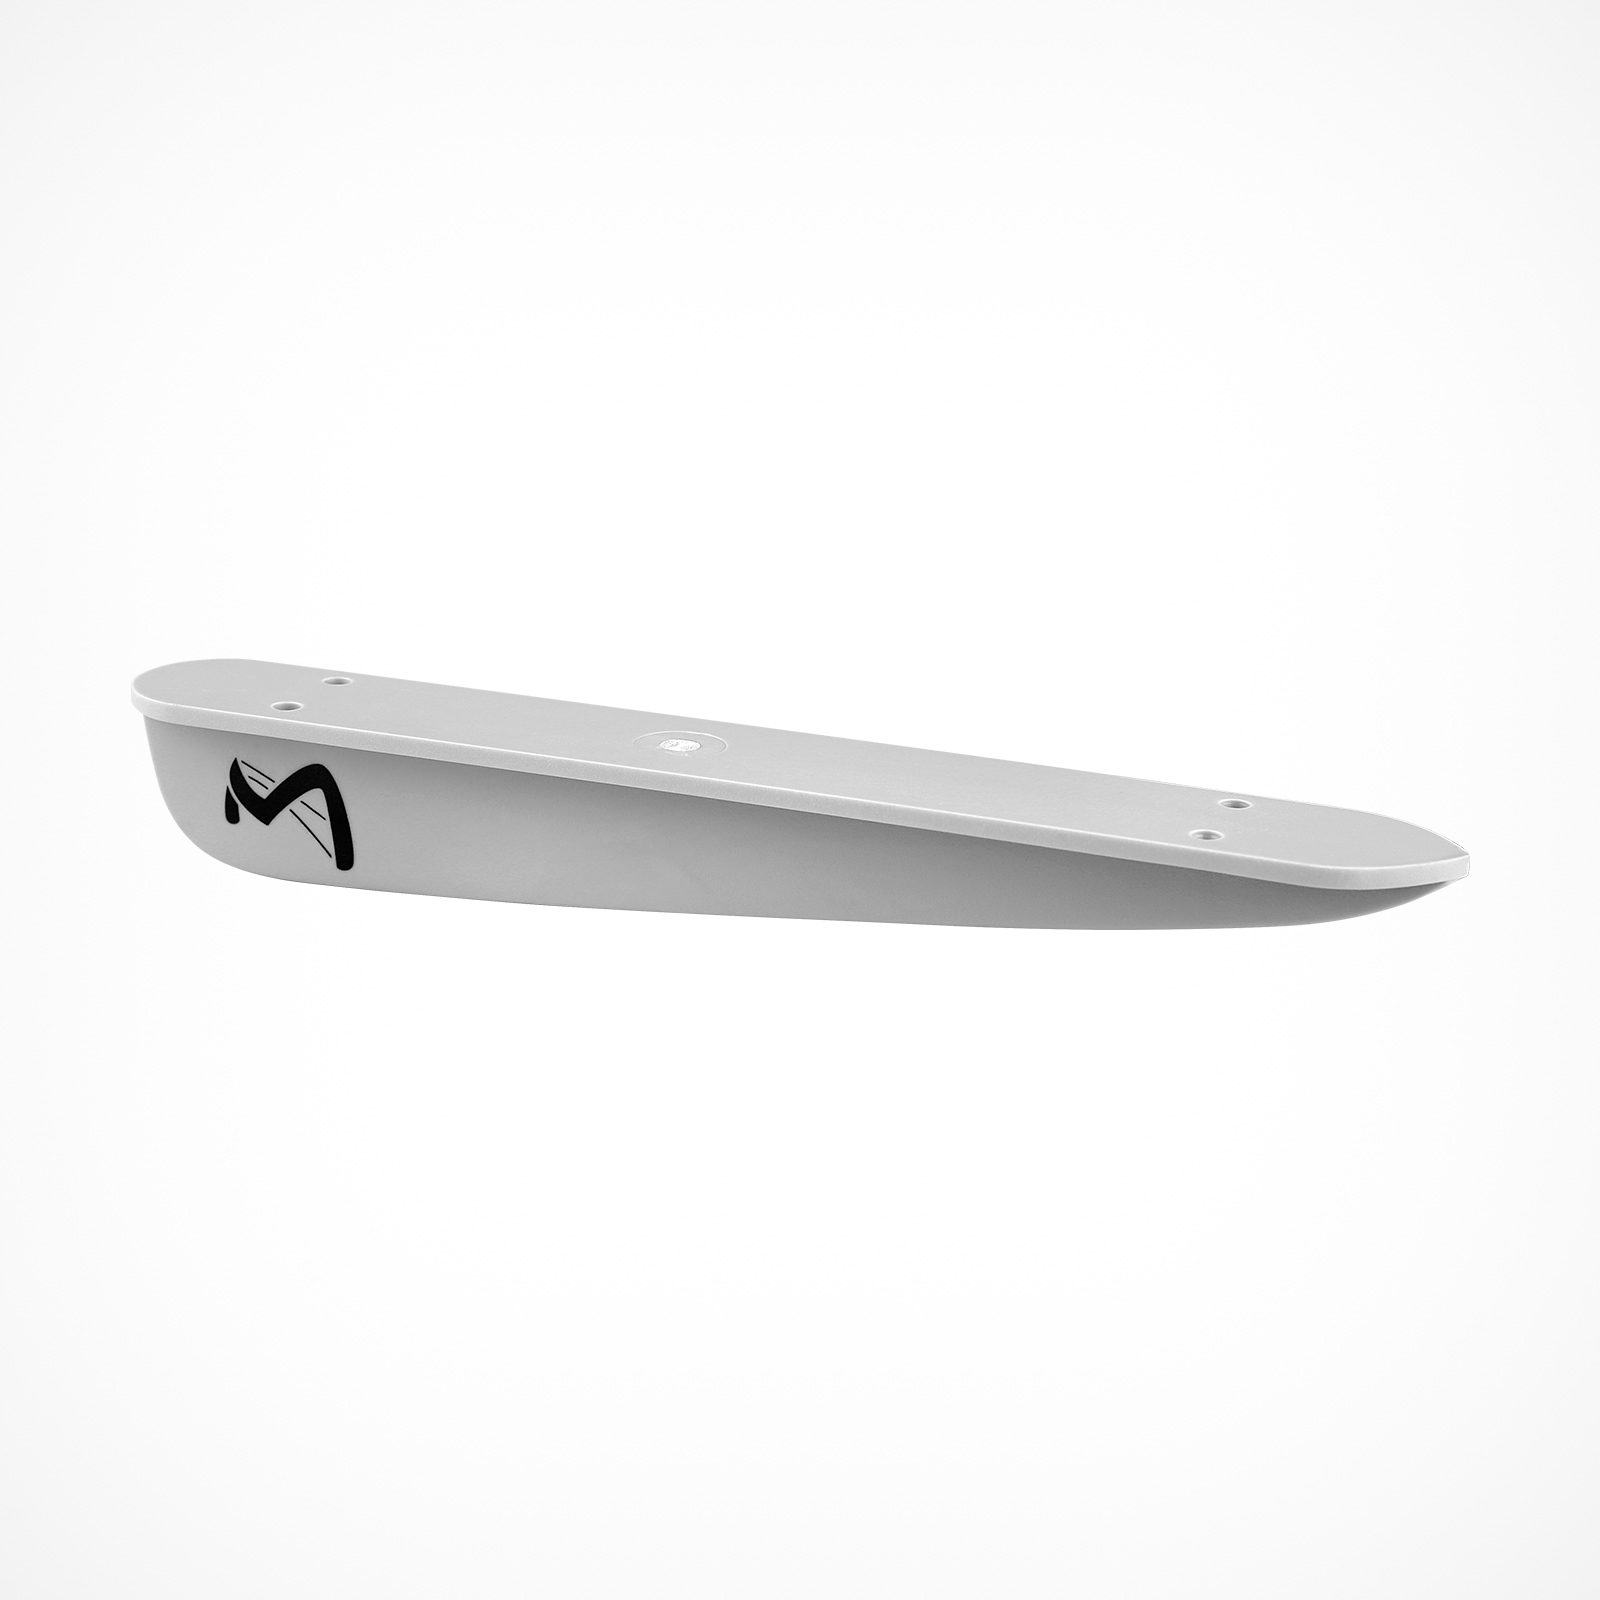 MESLE waterski-fin ABS complete, grey